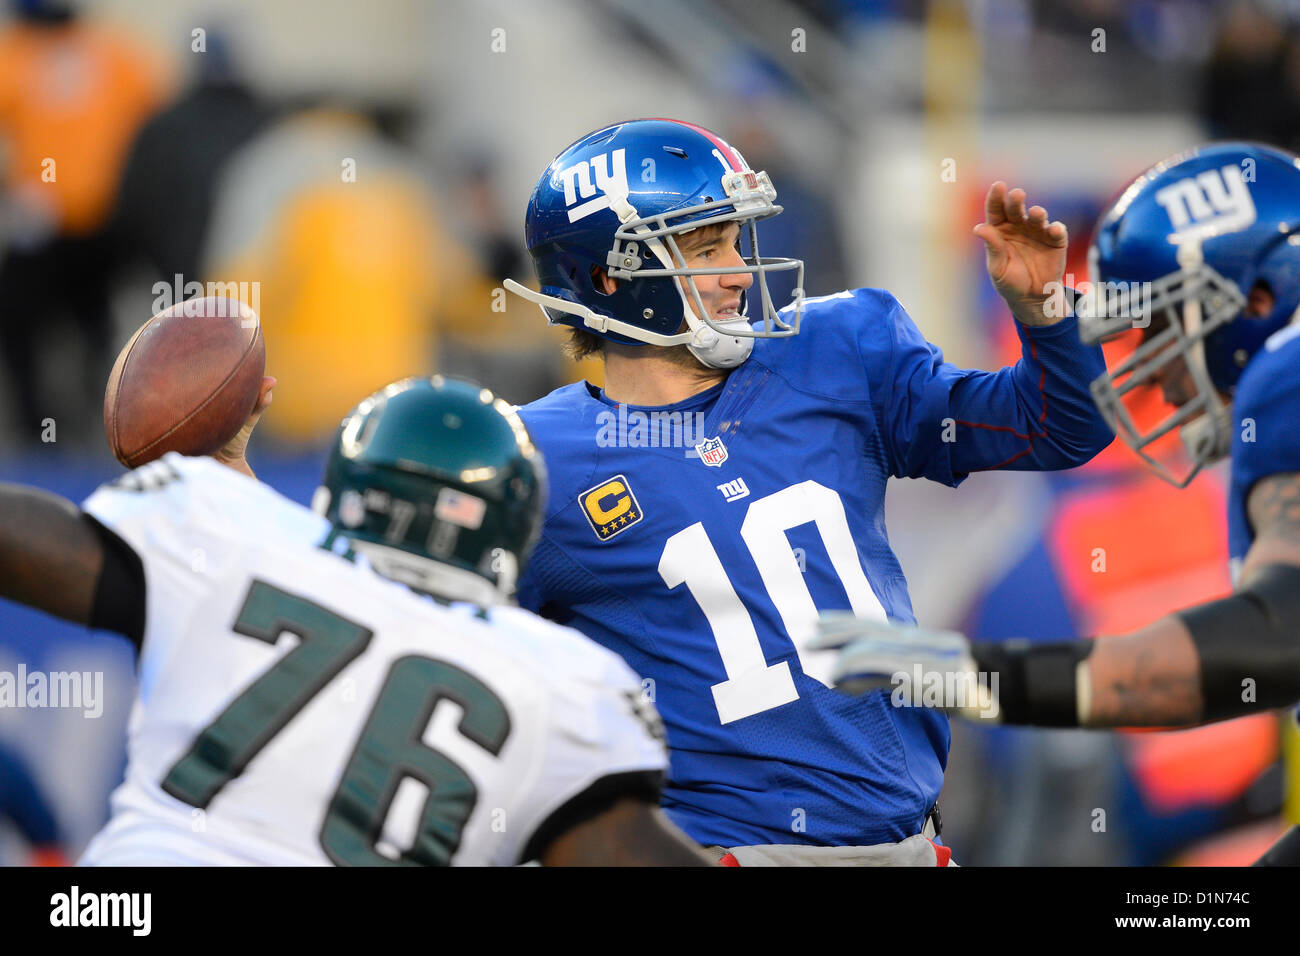 new jersey usa. 30 december 2012 new york giants quarterback eli manning (